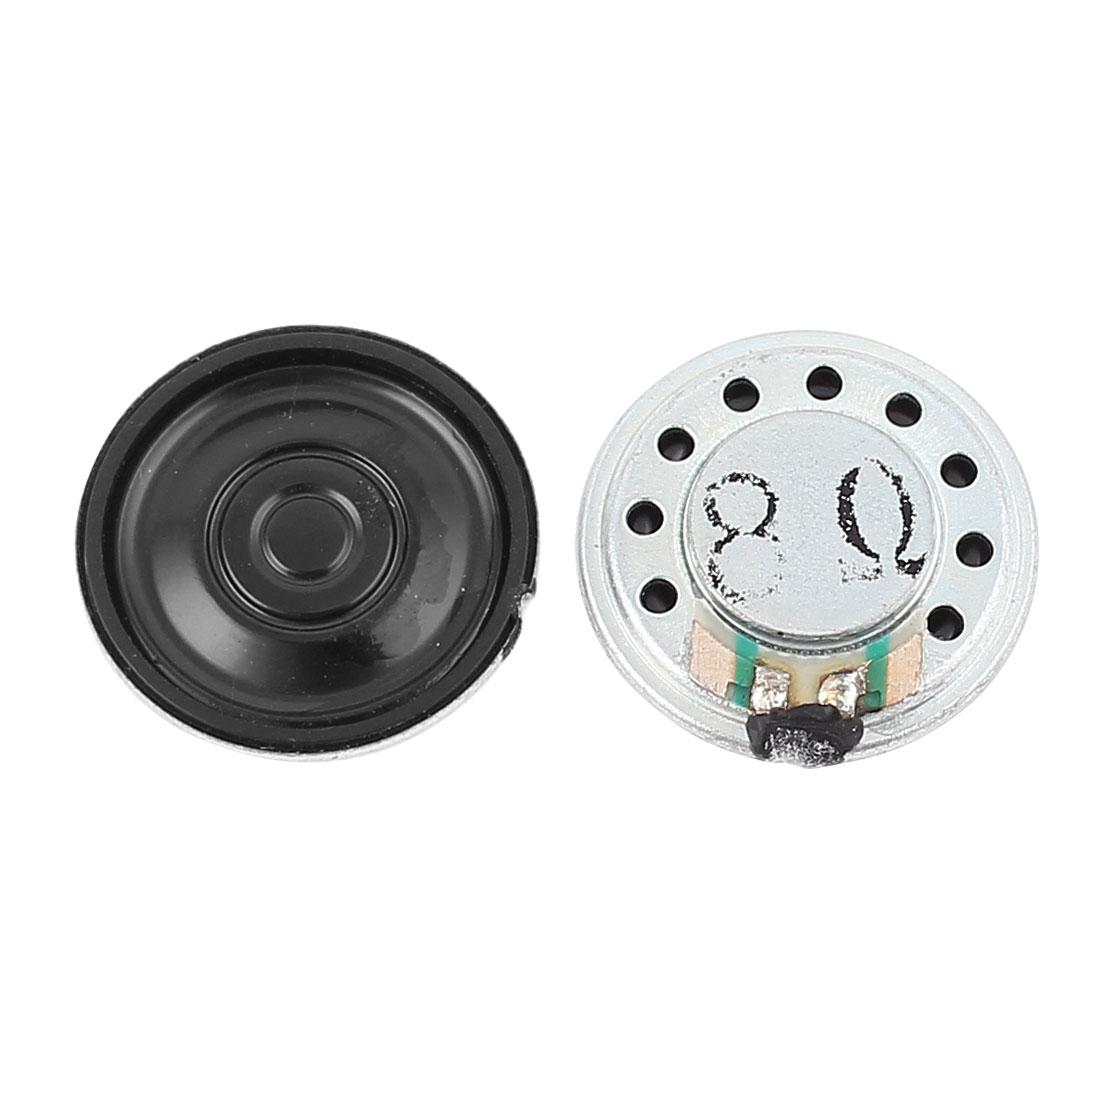 2 Pcs 1W 8 Ohm 23mm Round Inside Magnet Electronic Speaker Loudspeaker